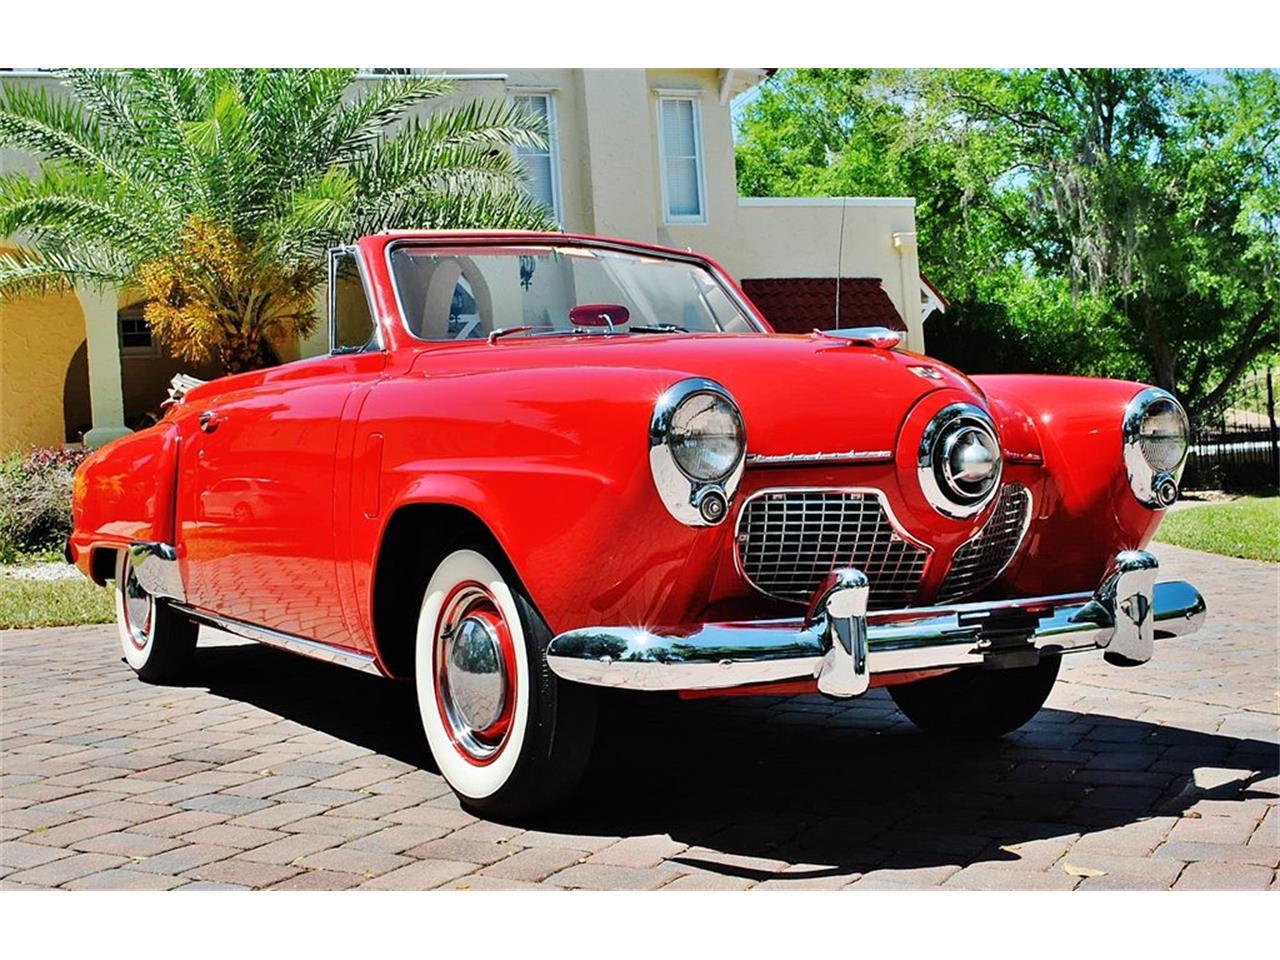 For Sale: 1951 Studebaker Champion in Lakeland, Florida